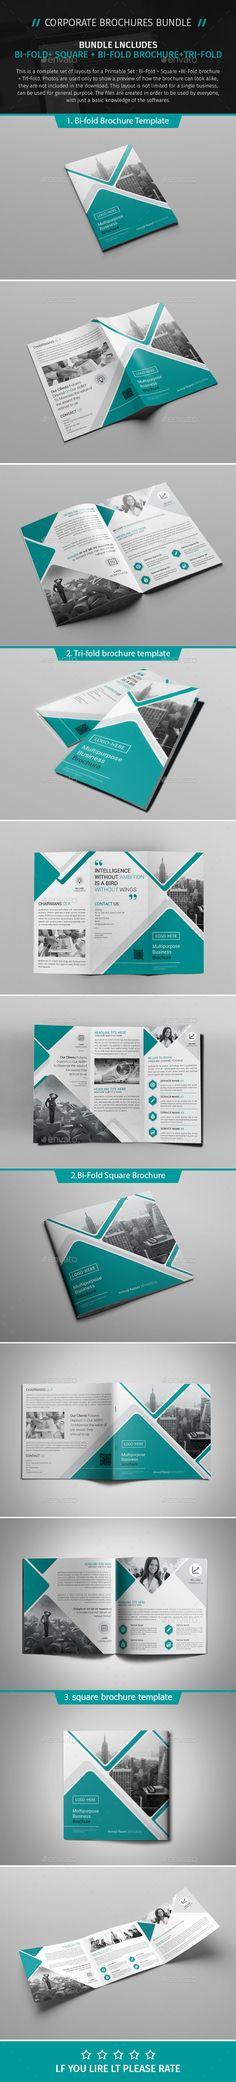 Brochure Bundle 06  — PSD Template #seo #business • Download ➝ https://graphicriver.net/item/brochure-bundle-06/18333505?ref=pxcr